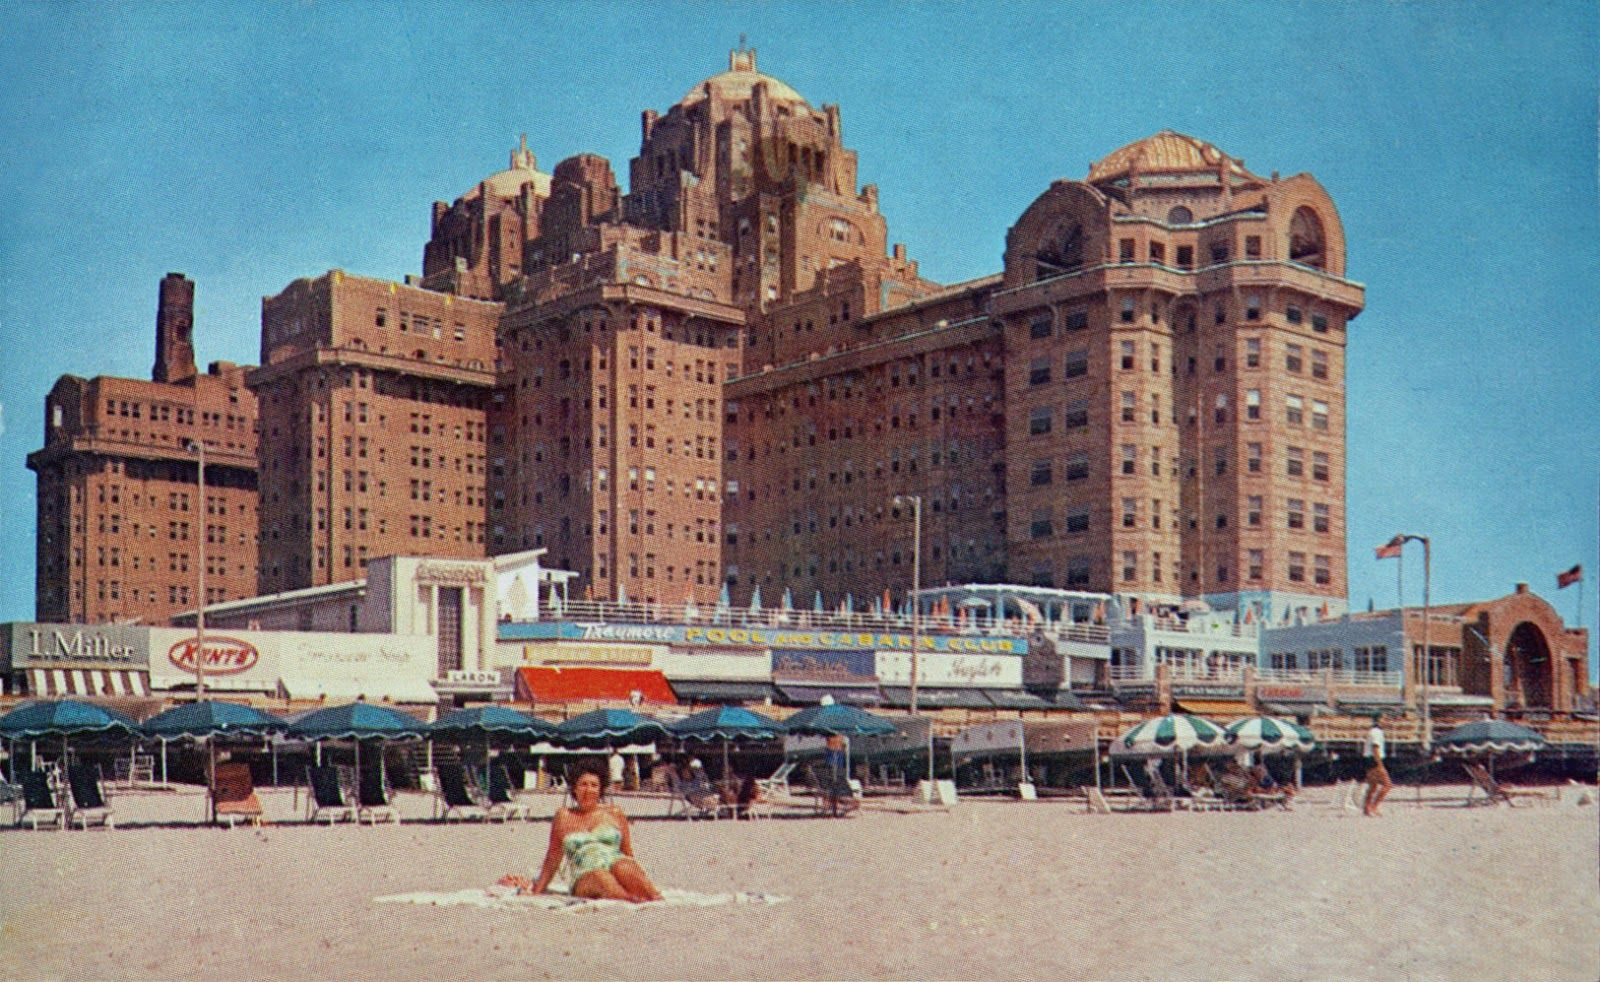 Hotel Traymore Atlantic City New Jersey Jpg Jpeg Image 1600 982 Pixels Atlantic City Atlantic City Hotels Atlantic City Boardwalk